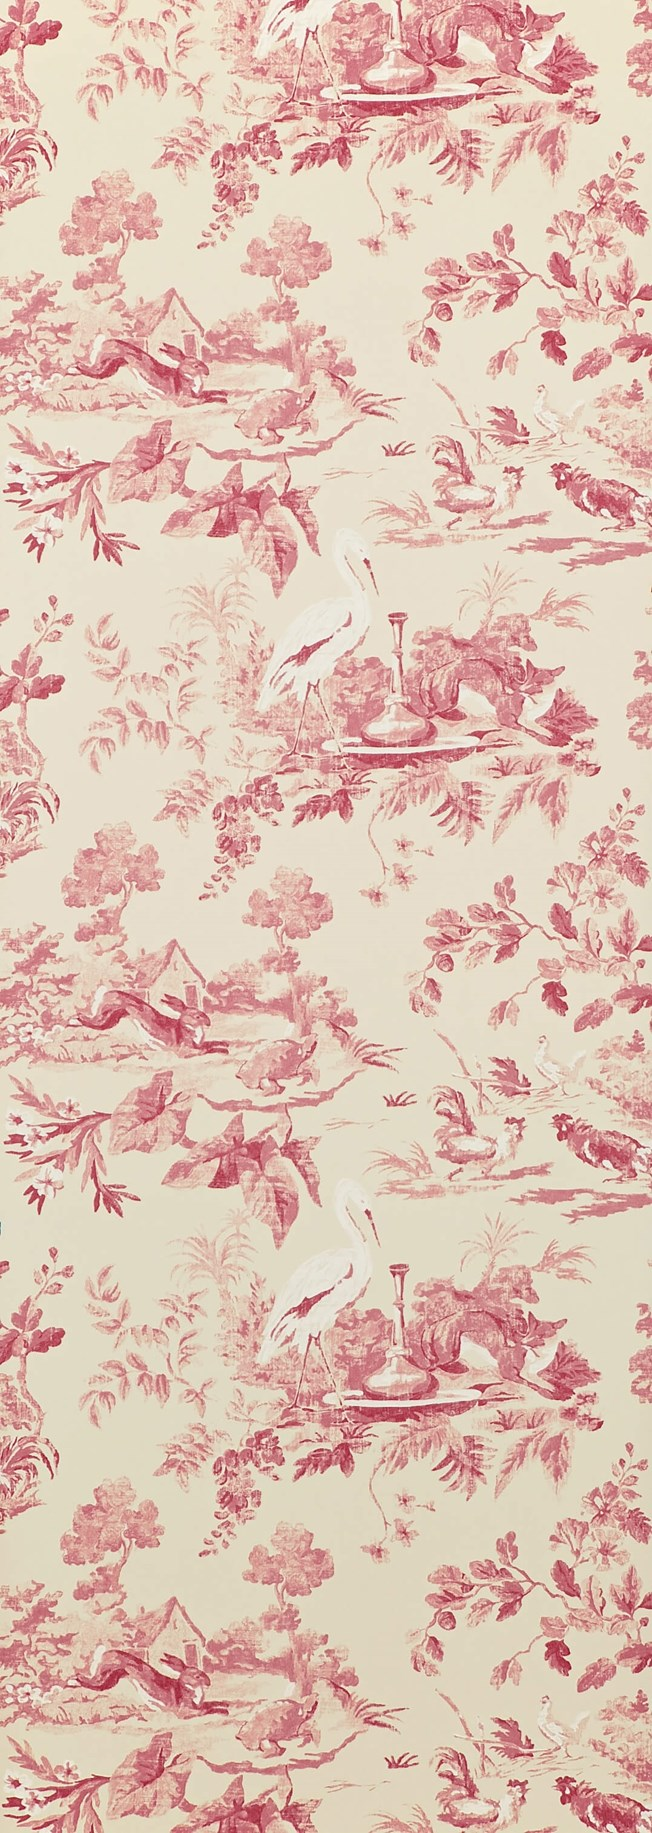 Sanderson Aesop's Fables Pink tapet